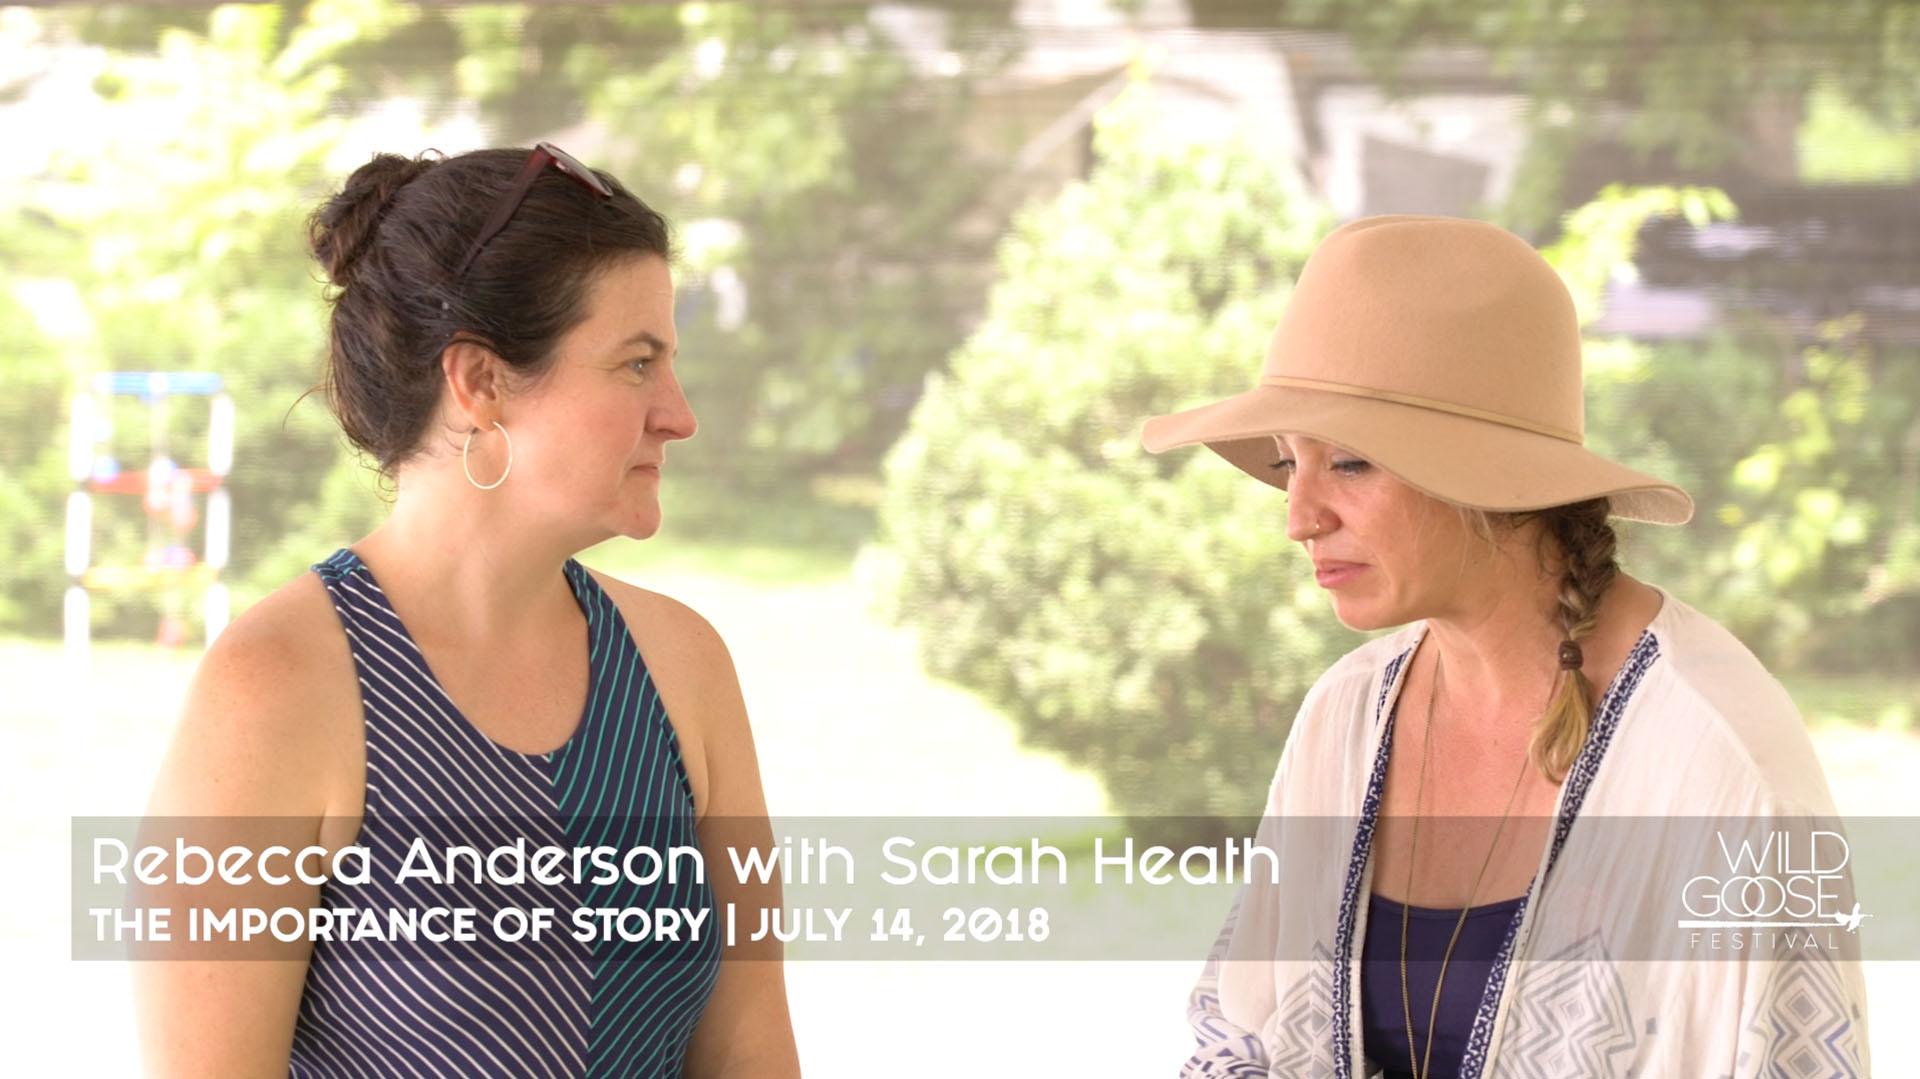 Rebecca Anderson with Sarah Heath